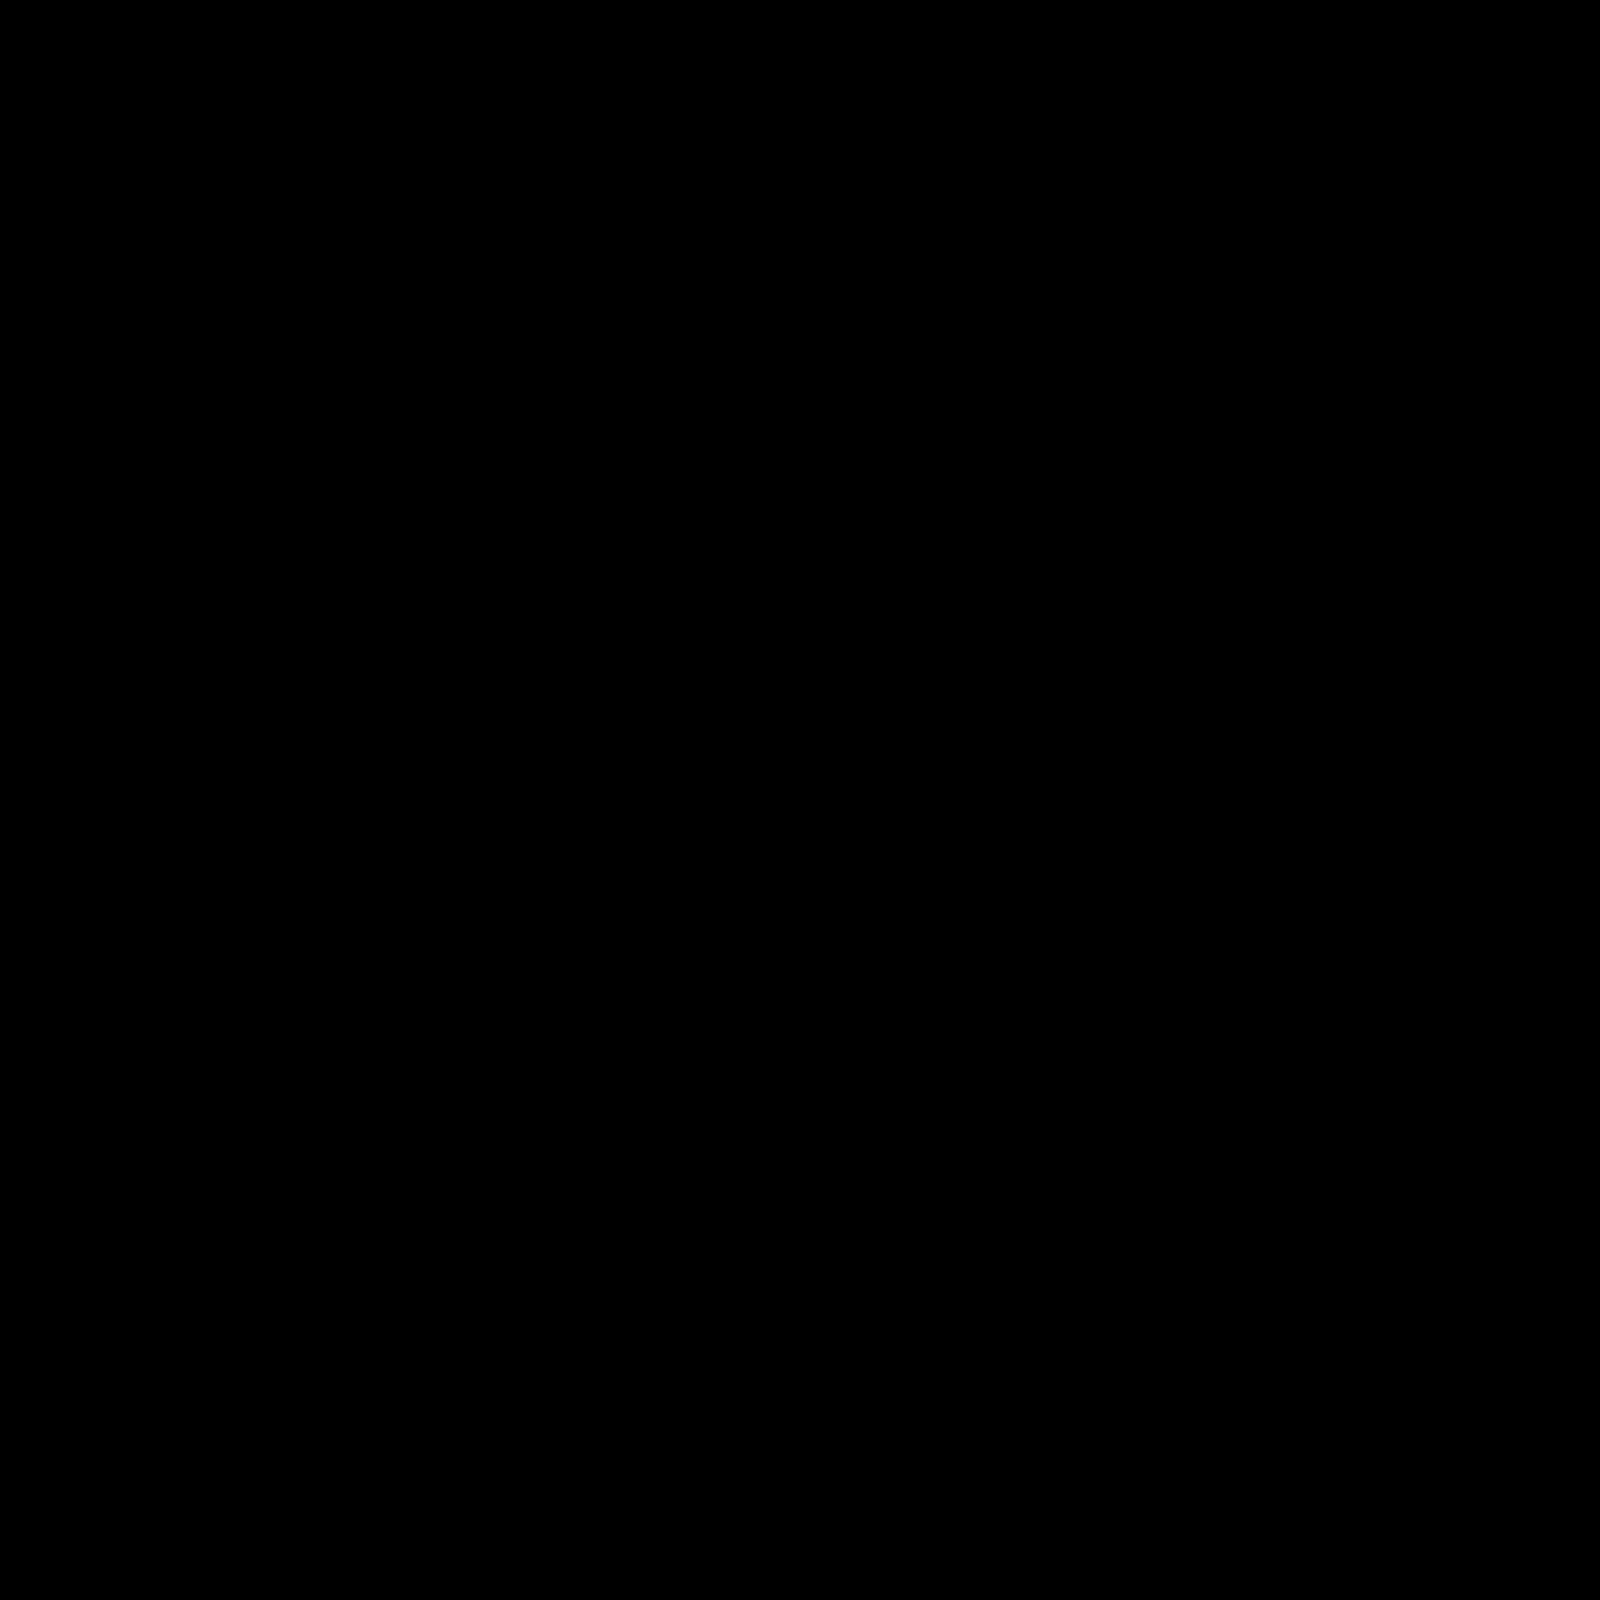 Manatee icon